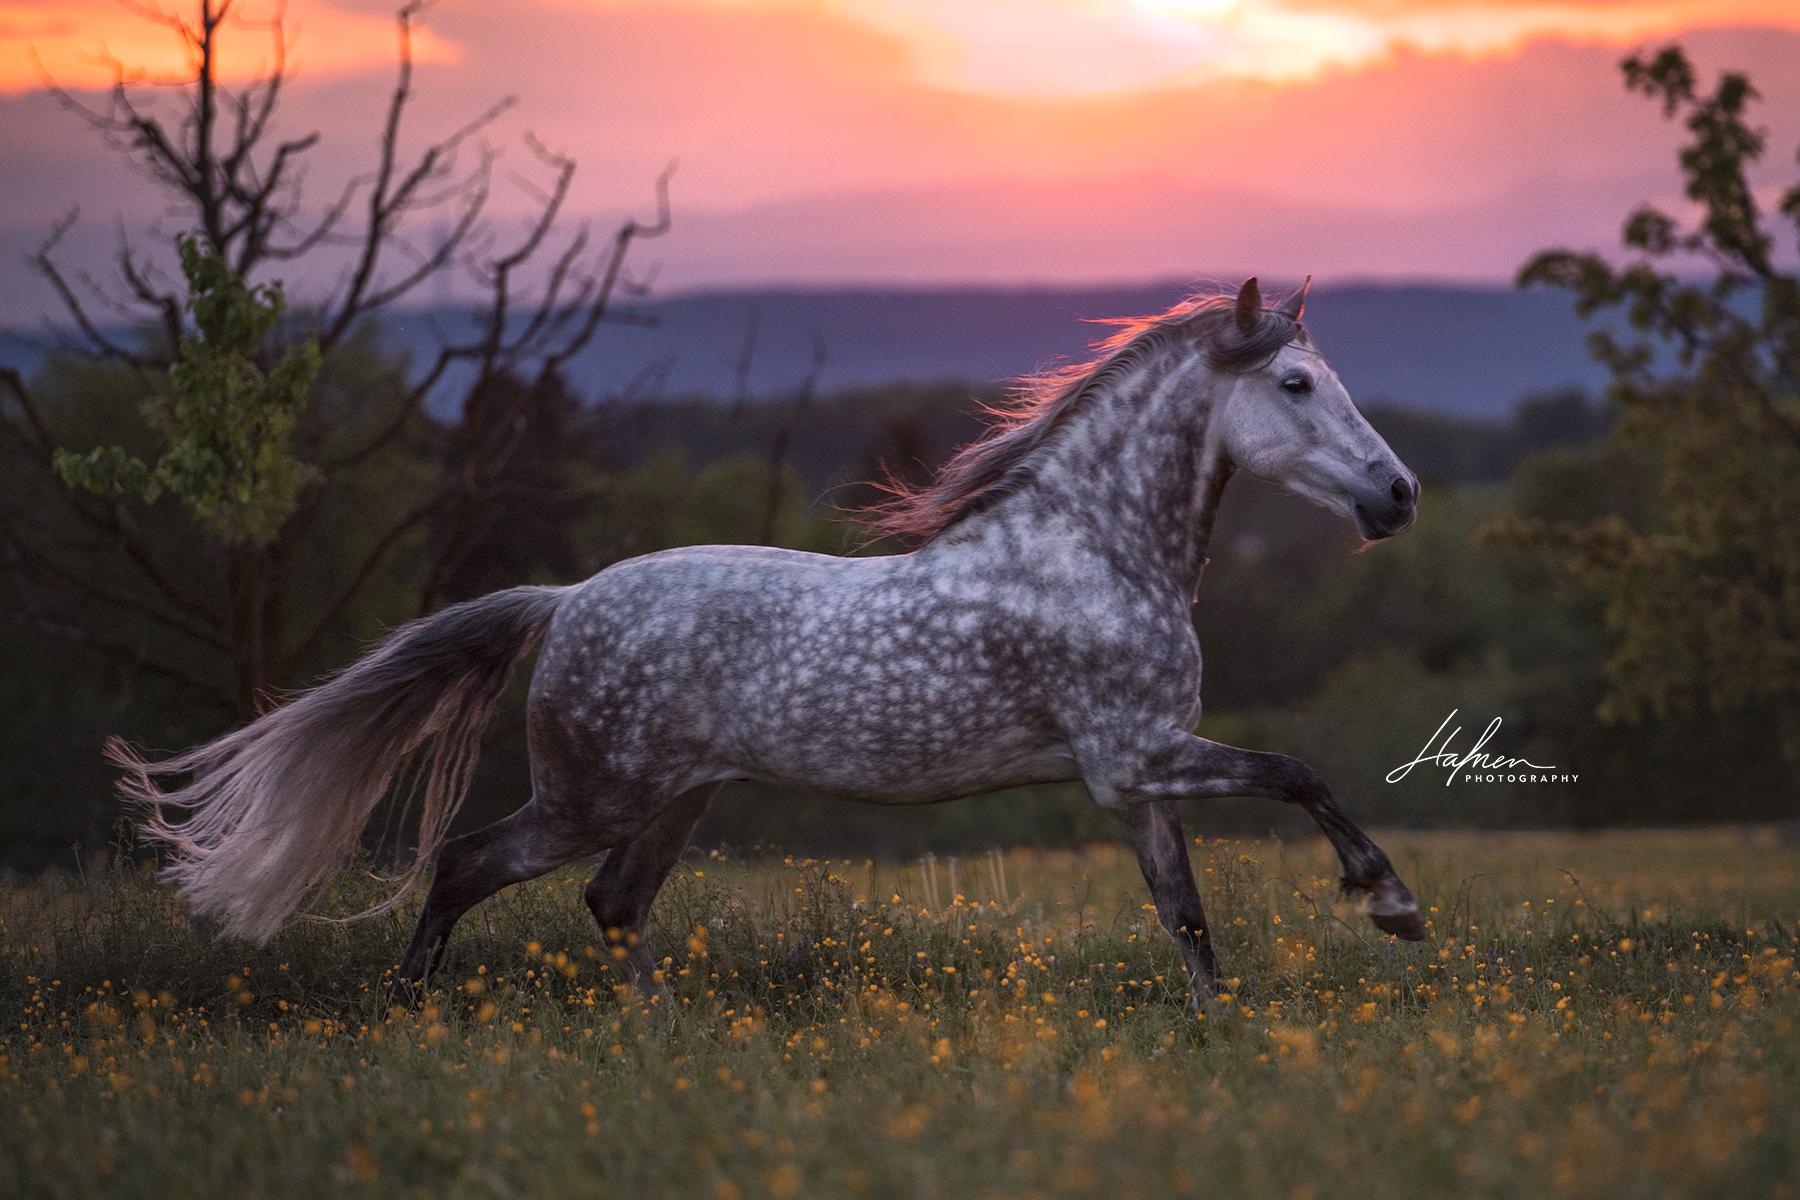 Andalusier Wallach Galoppiert Im Sonnenuntergang Uber Die Wiese Pre Schimmel Apfelschimme Apfelschimmel Pferde Pferde Fotografie Pferde Hintergrundbilder